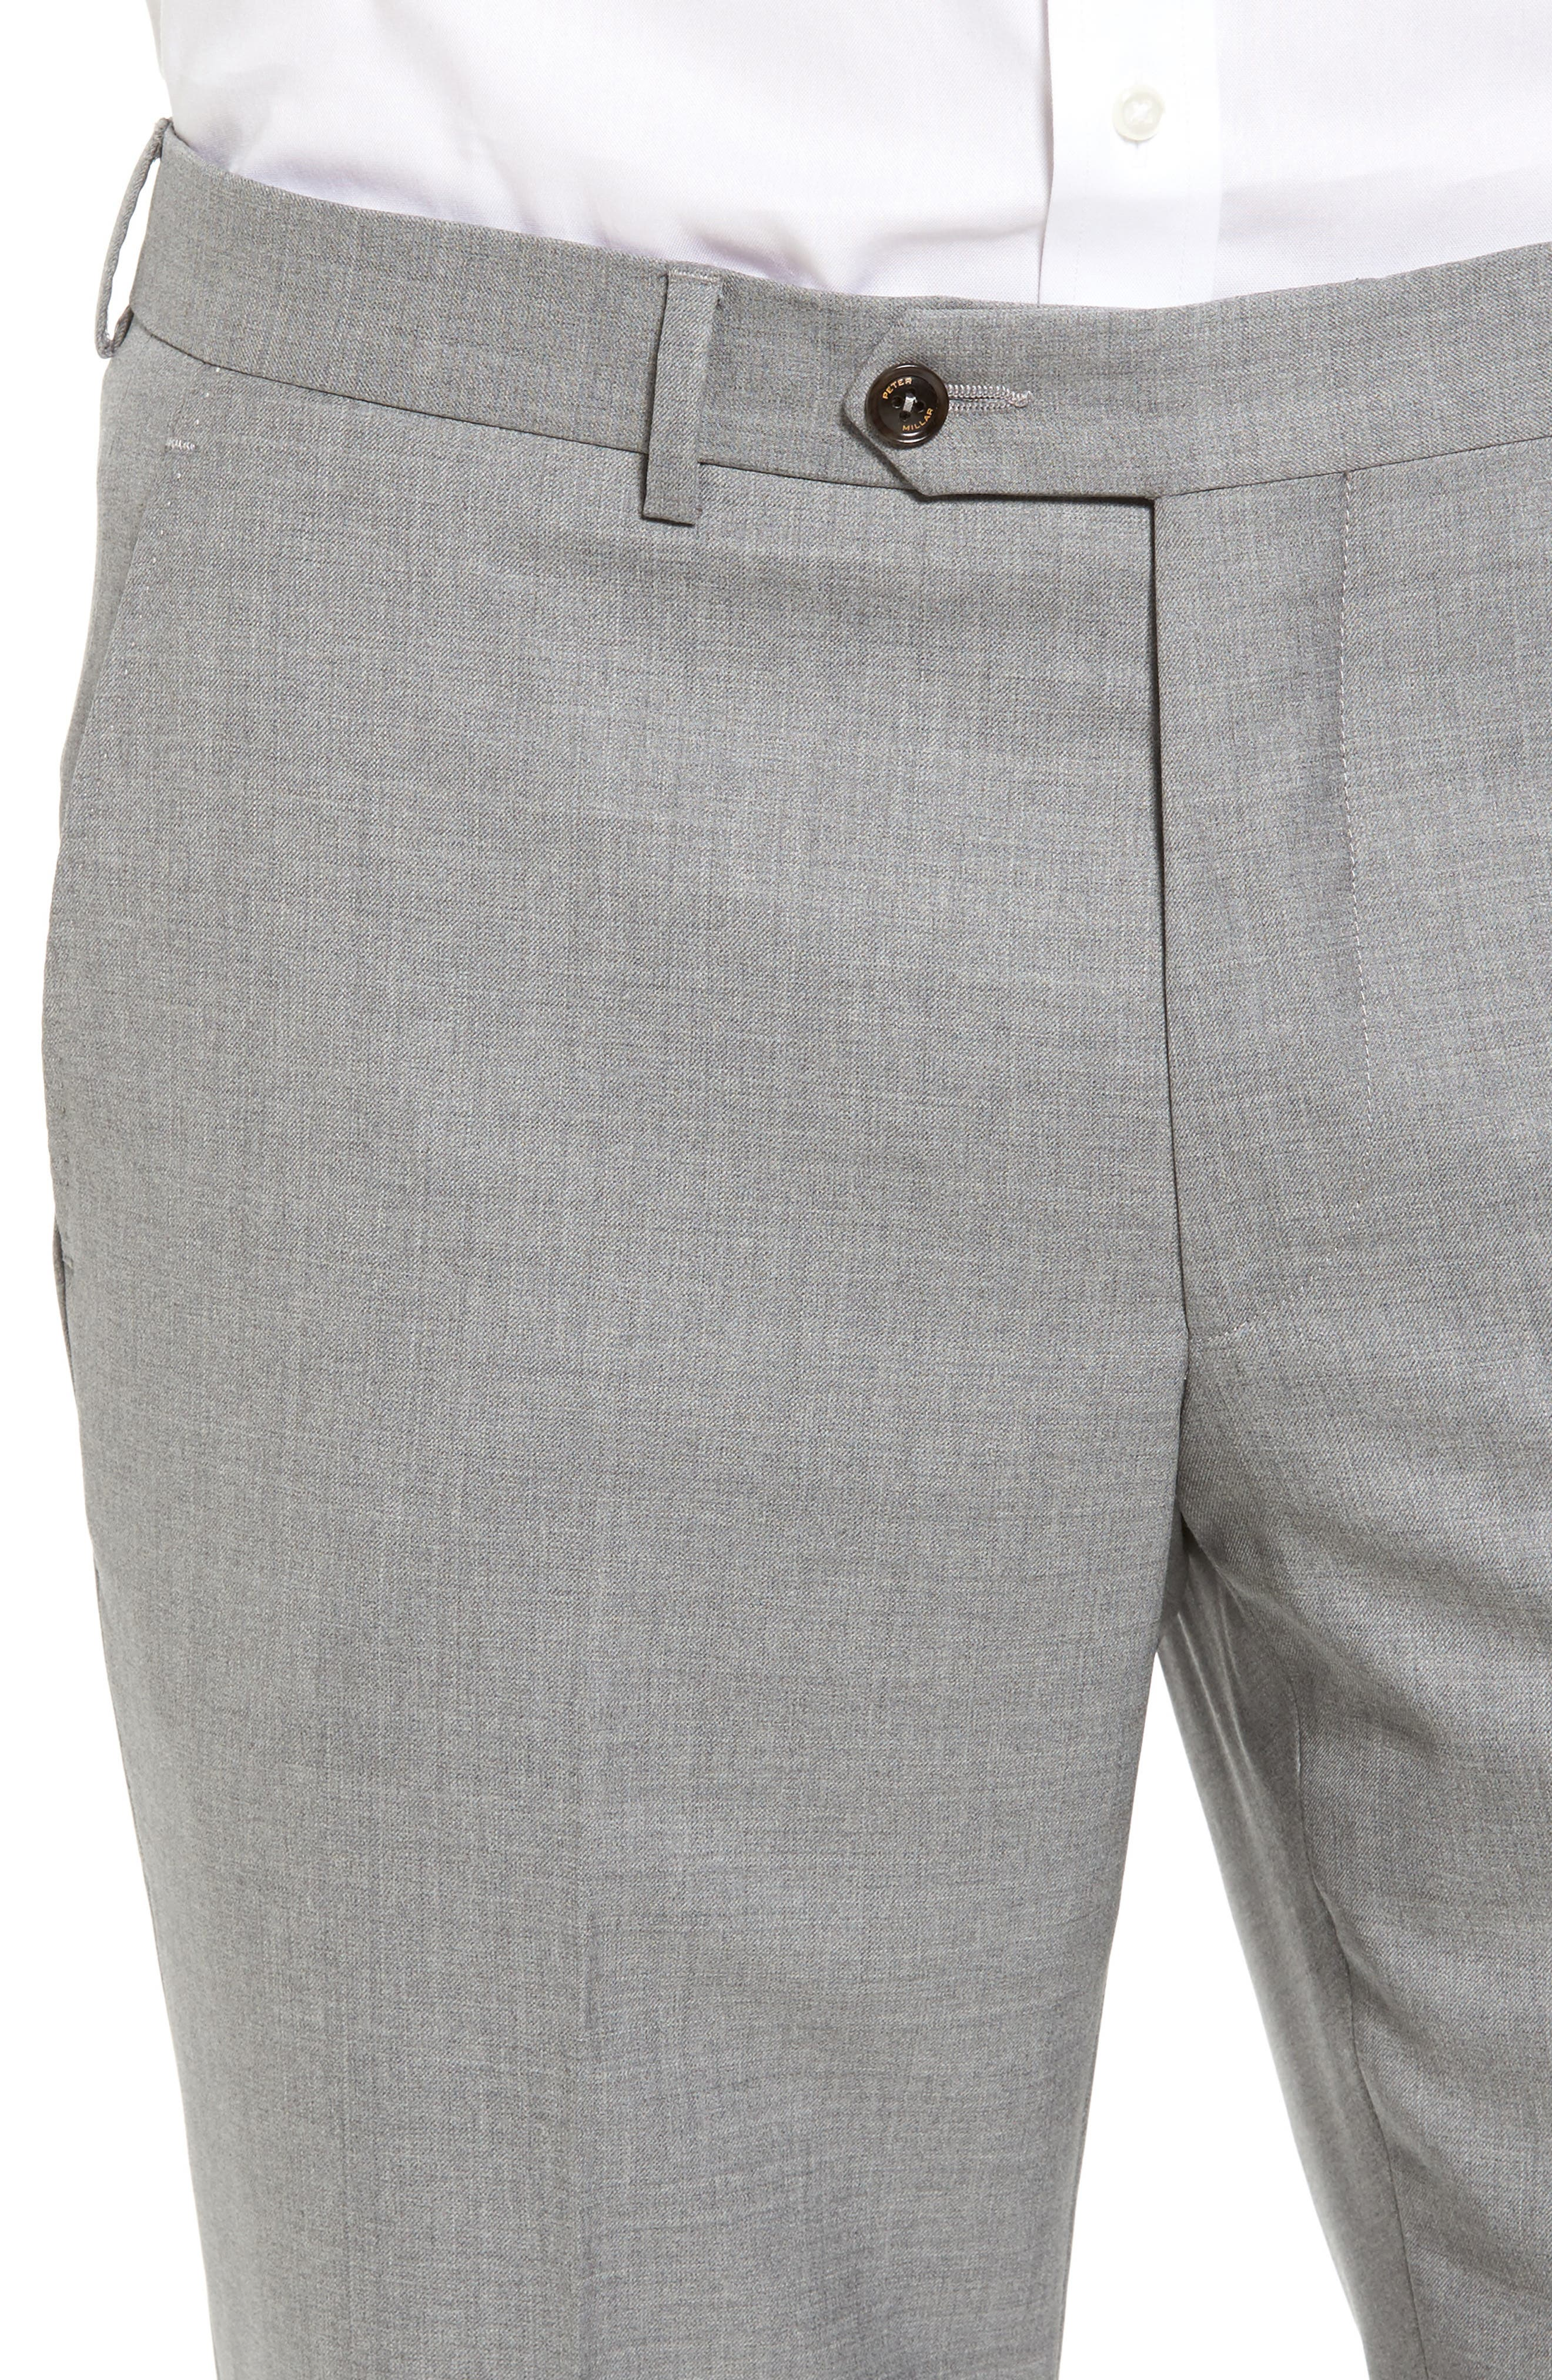 Peter Millar Multi Season Super 150s Wool Flat Front Trousers,                             Alternate thumbnail 4, color,                             047